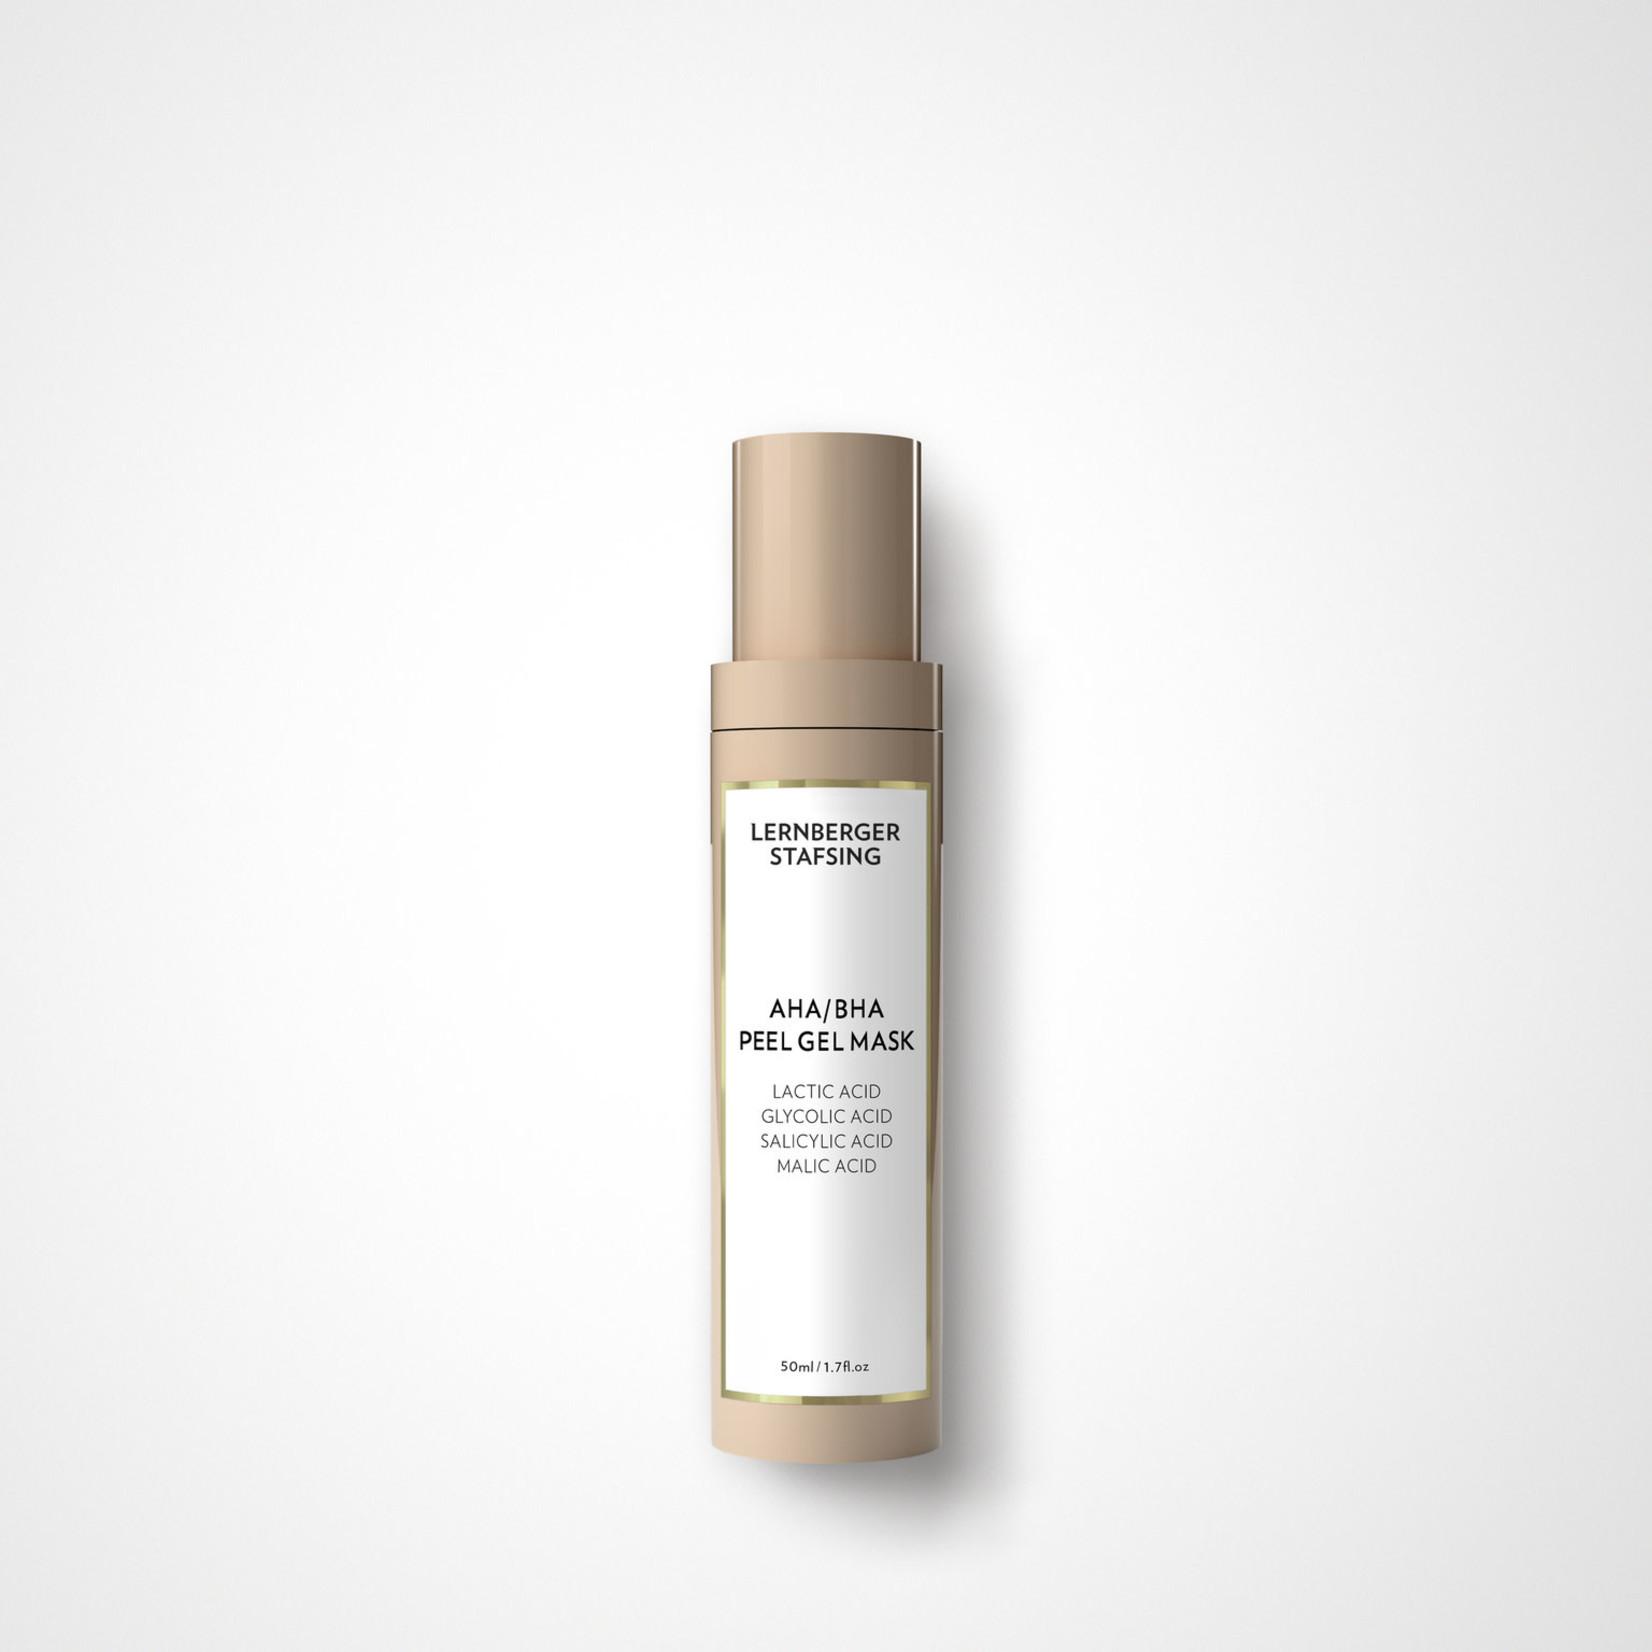 Lernberger Stafsing Peel gel masque AHA/BHA LS